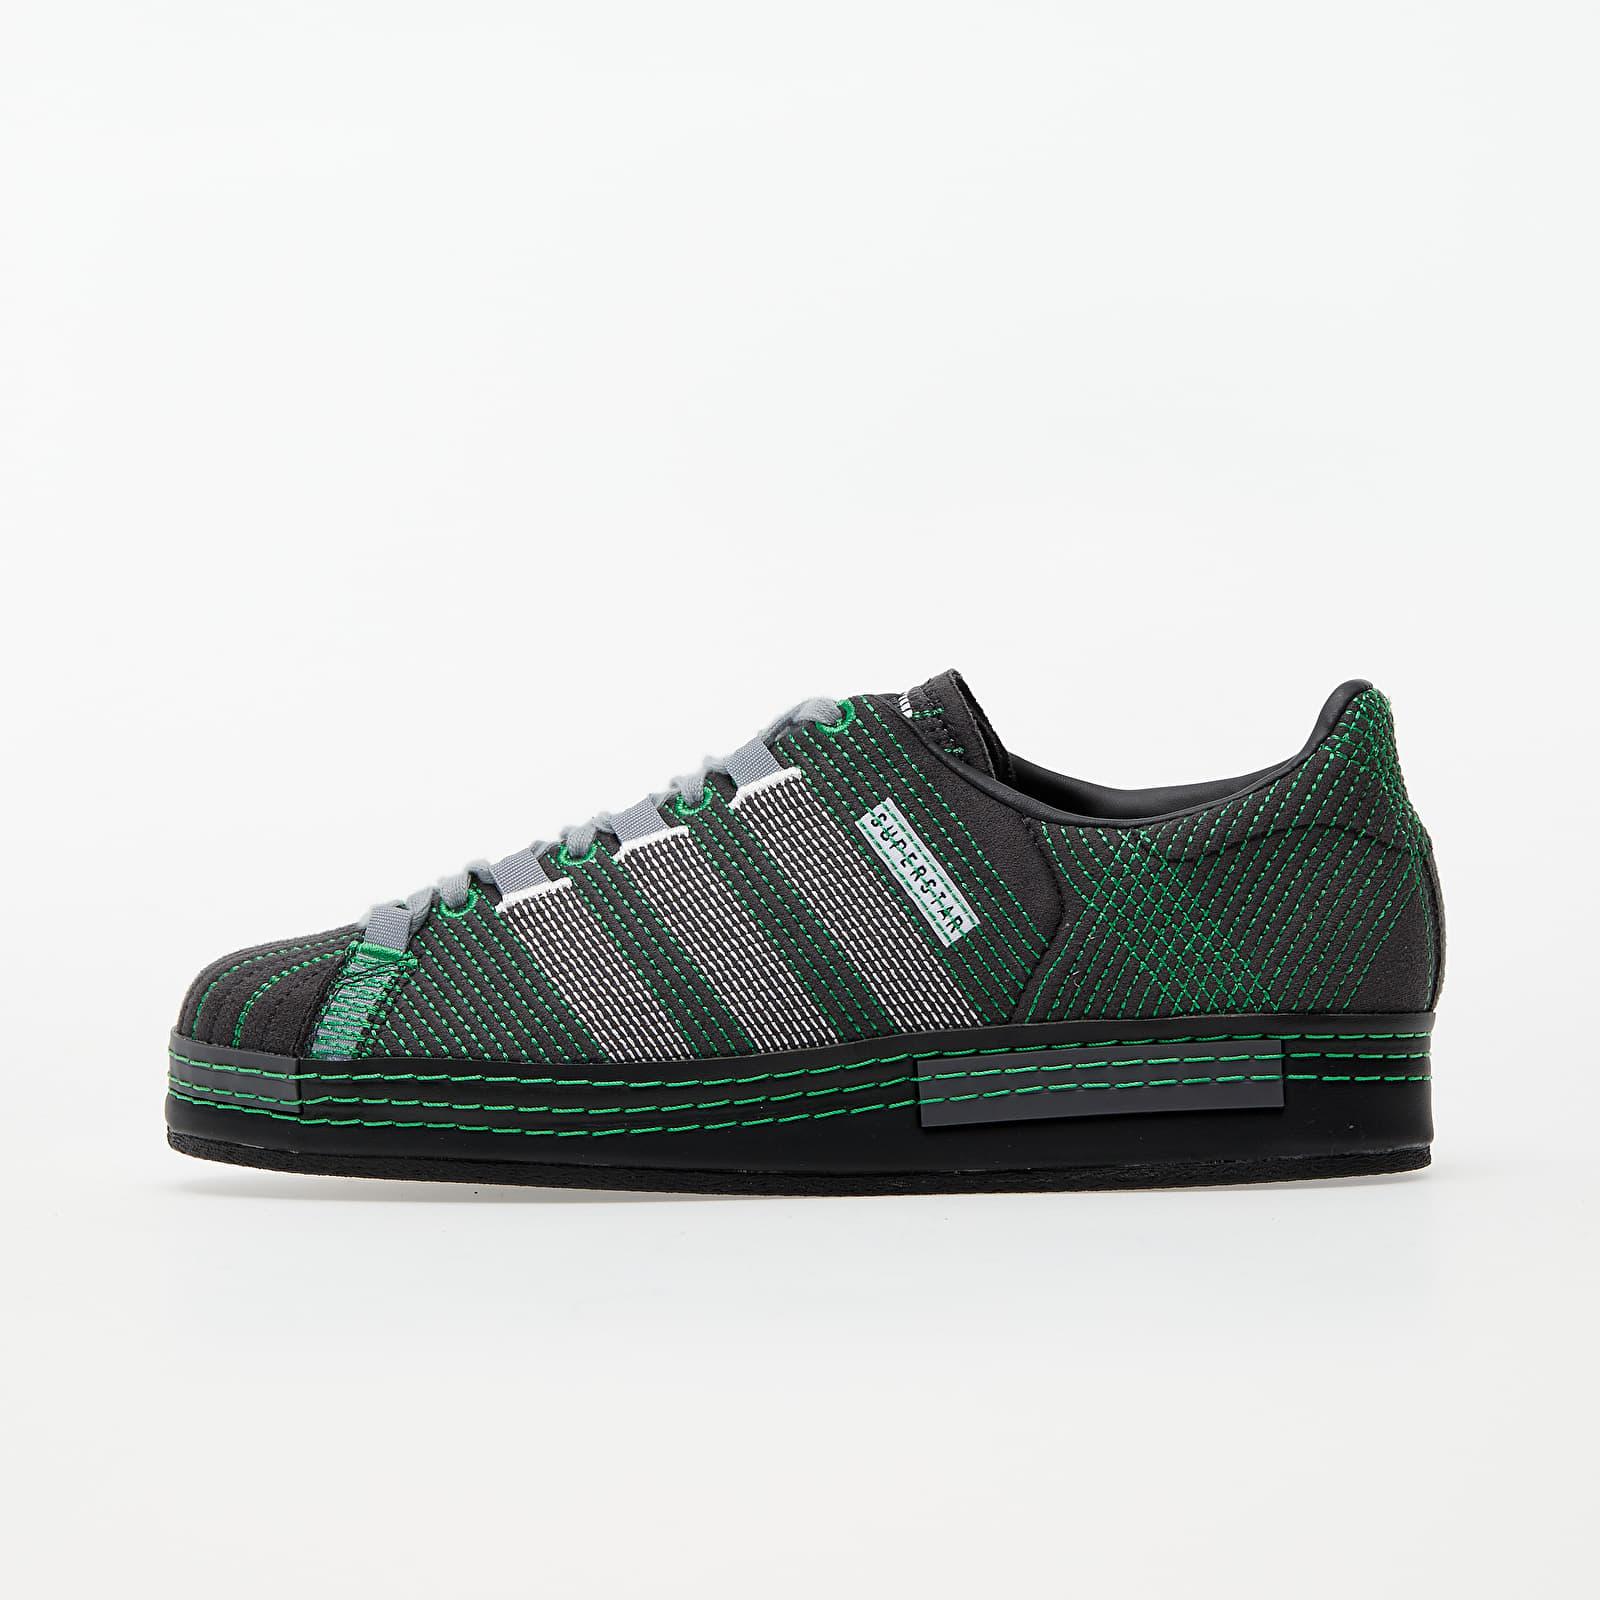 adidas x Craig Green Superstar Utility Black/ Core Black/ Green EUR 41 1/3